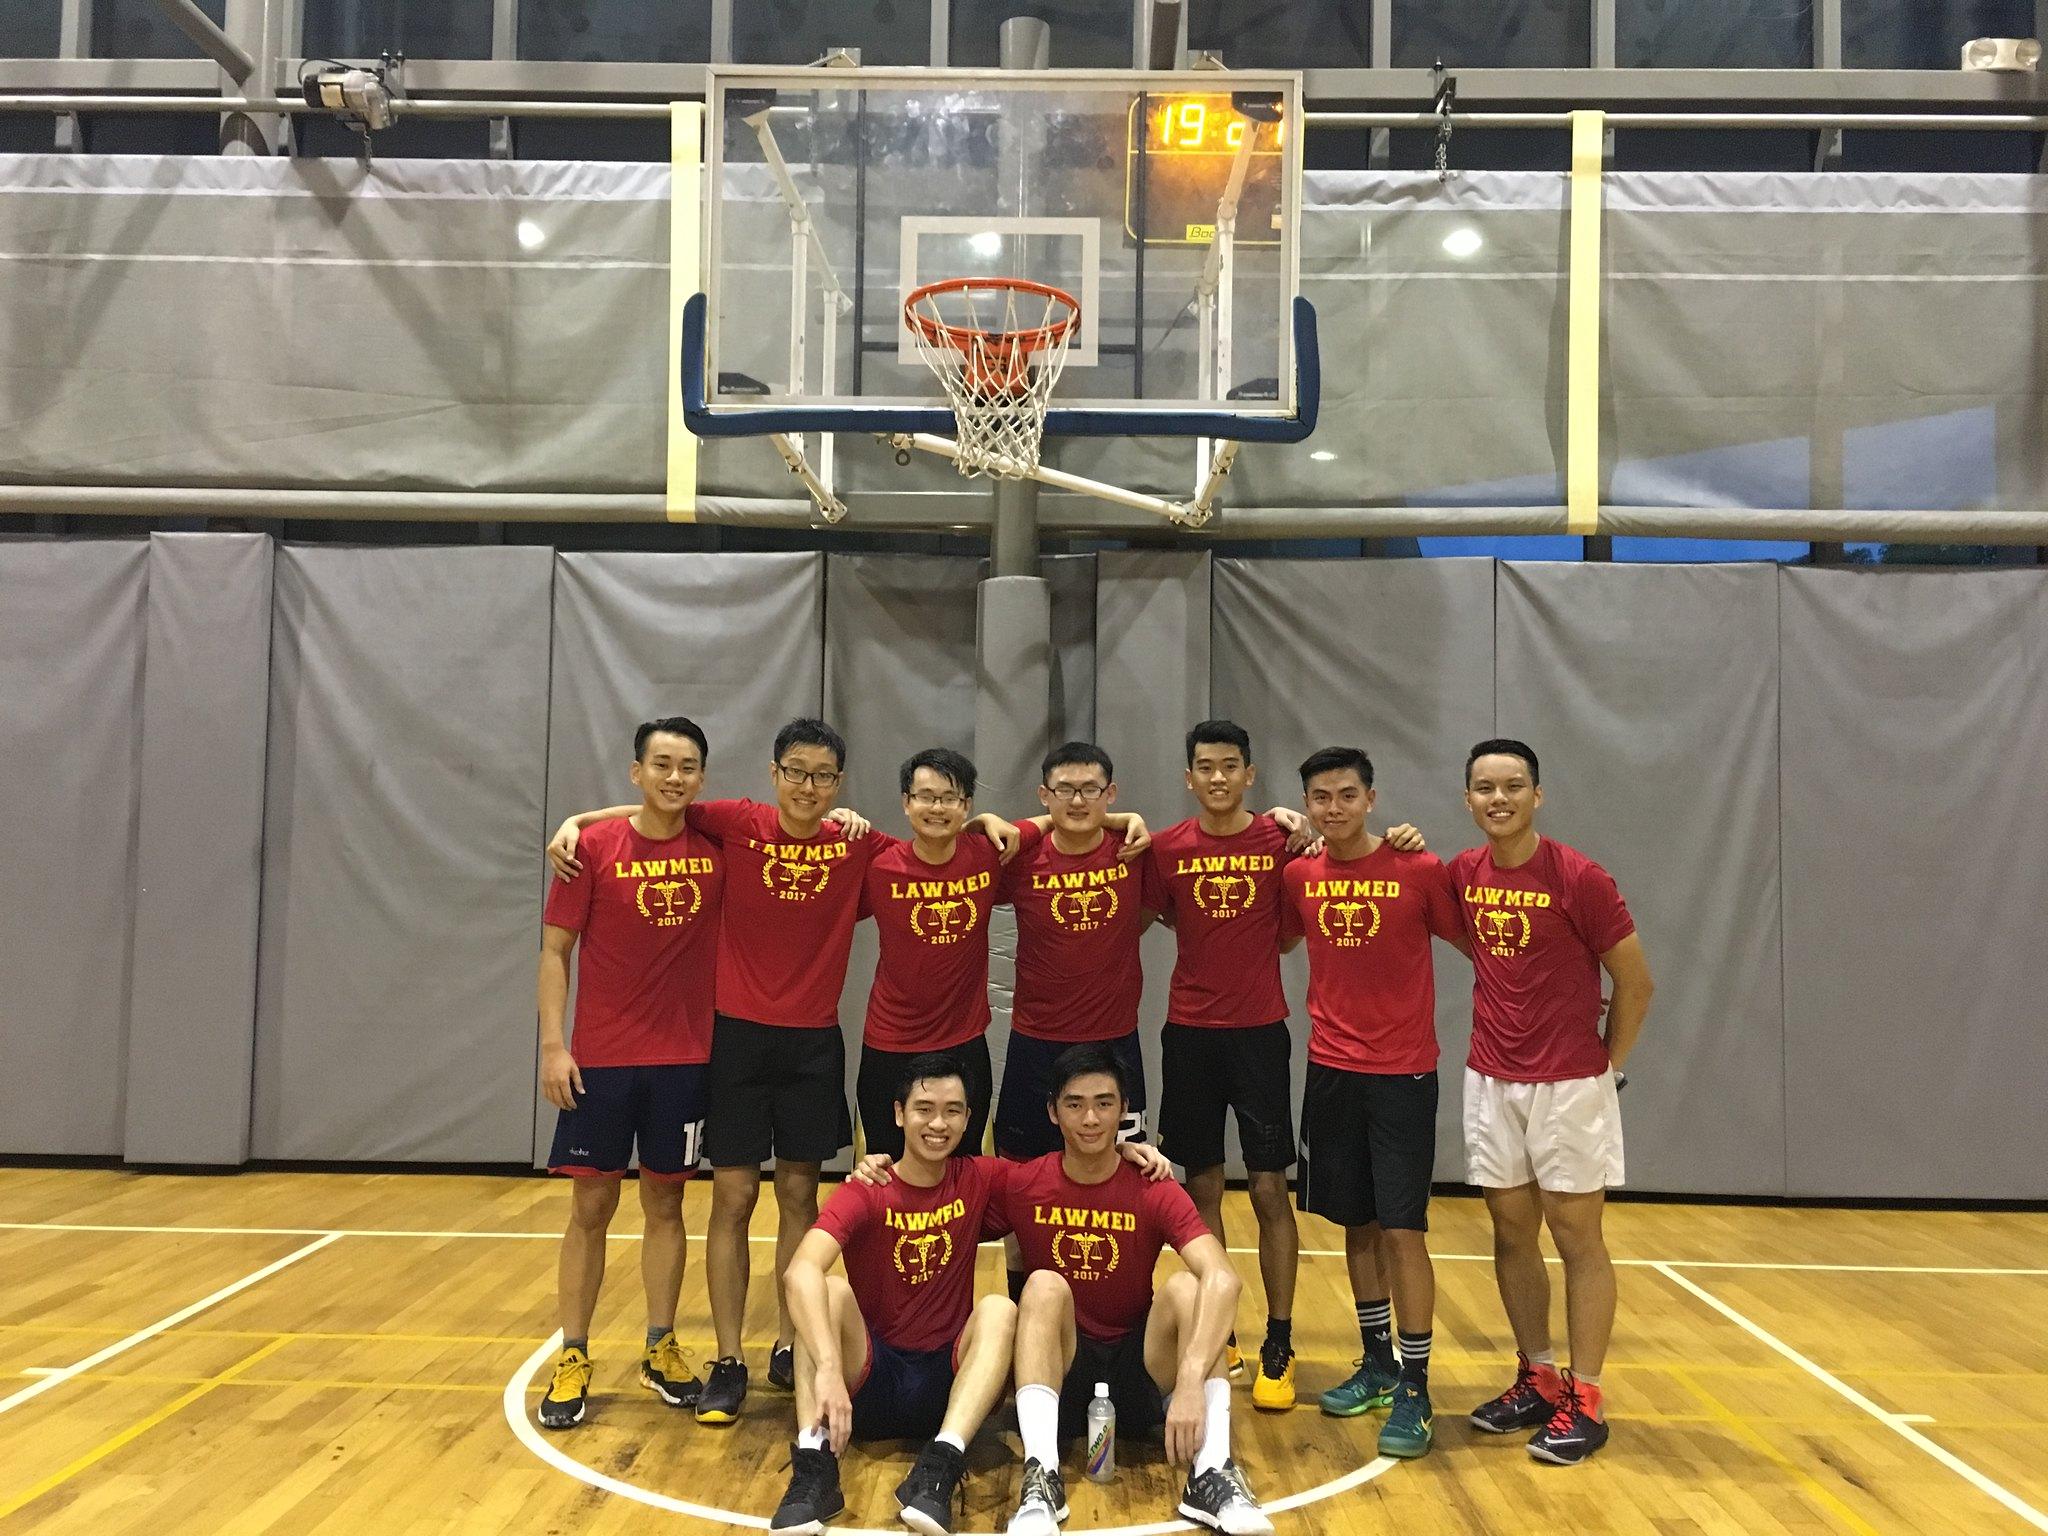 Caption: The Boys: (2nd Row) L-R: Nick Choo (Y2), John Wu (Y1), Your Humble Author (Y1), Walter Wan (Y2), Benedict Ted (Y1), Nick Yap (Y2), Josiah Tham (Y2) (At Front) L-R: Brendan Loy (Y1), Linming Ho (Y1)